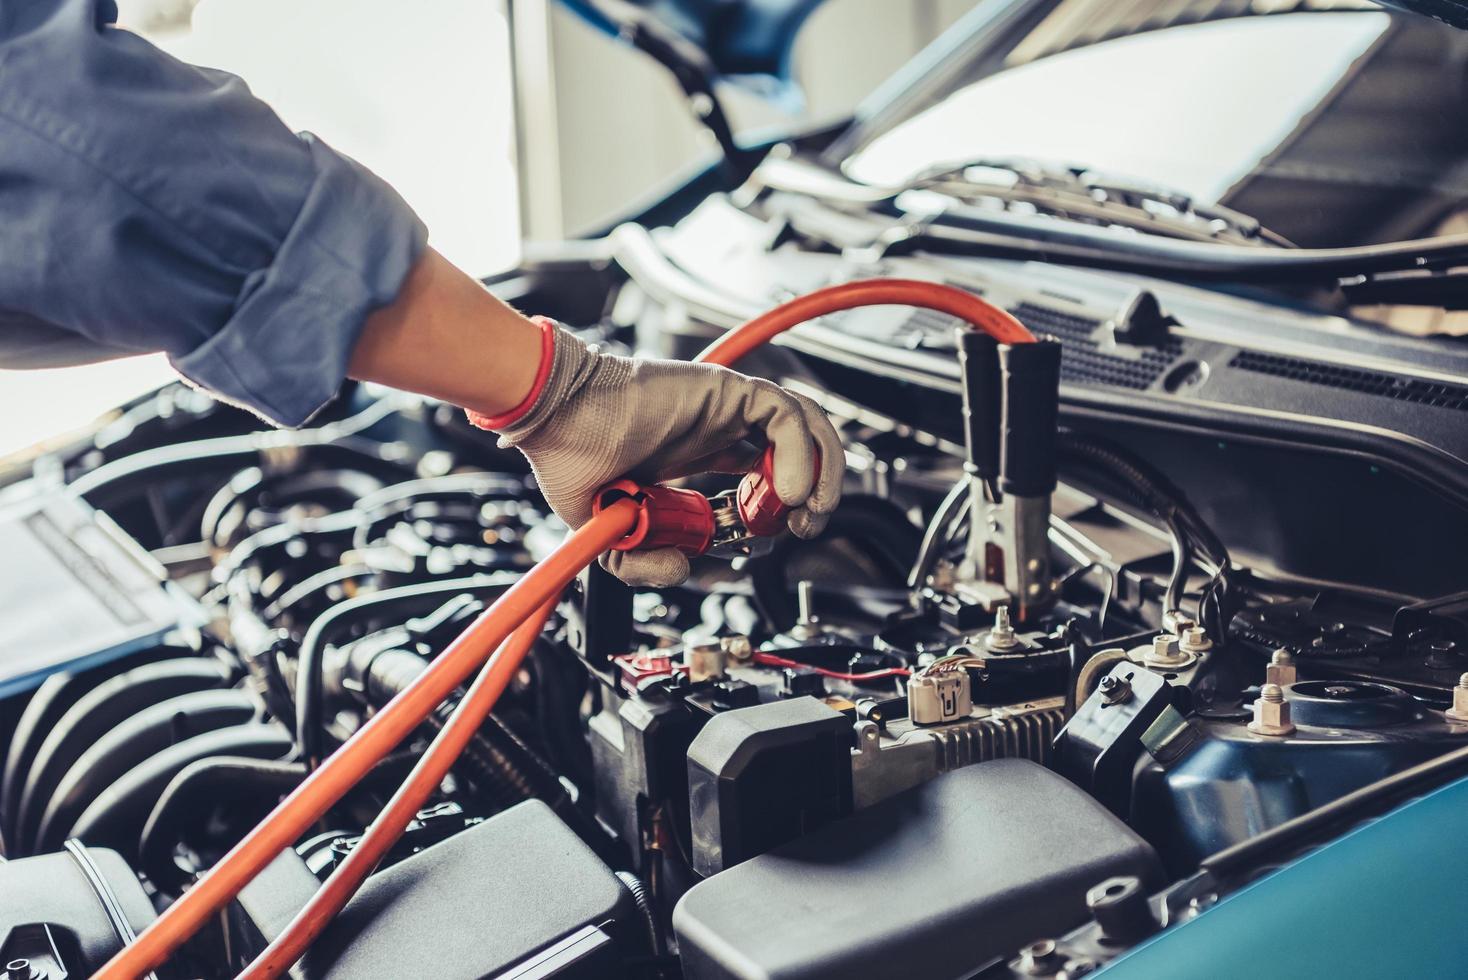 Automechaniker hält Überbrückungskabel foto